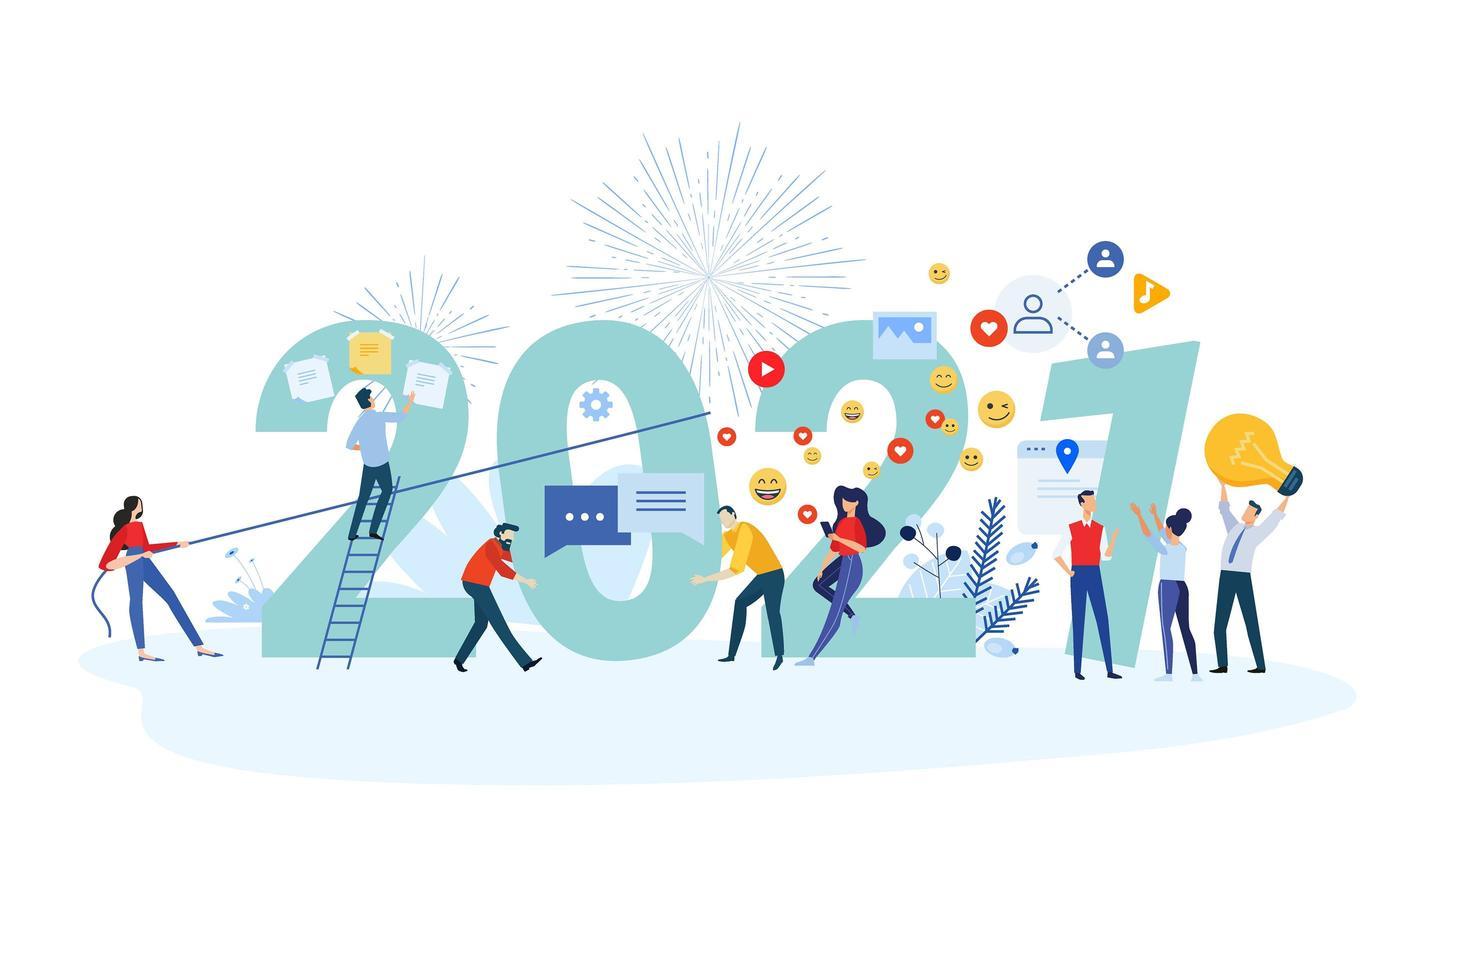 New Year 2021 marketing vector